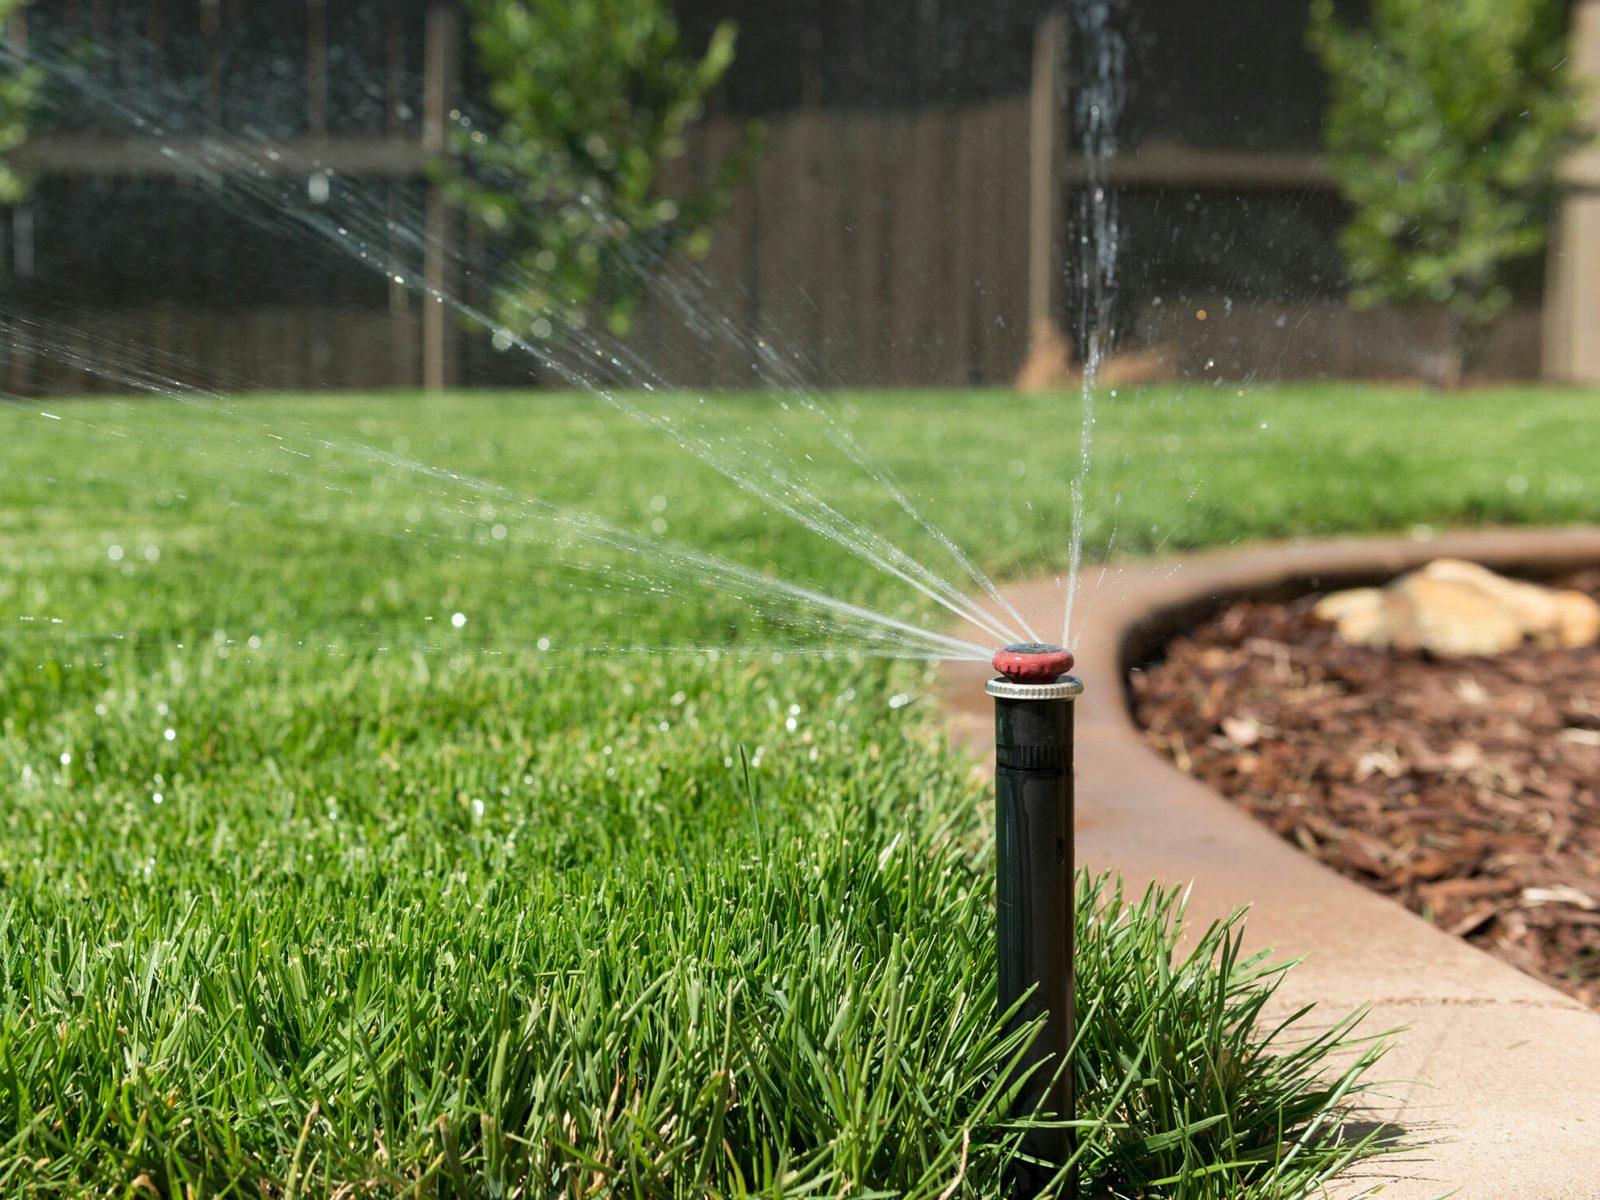 EEEXX3 Sprinkler head taken from a low wide angle spraying water onto a green backyard lawn in Sacramento, California.